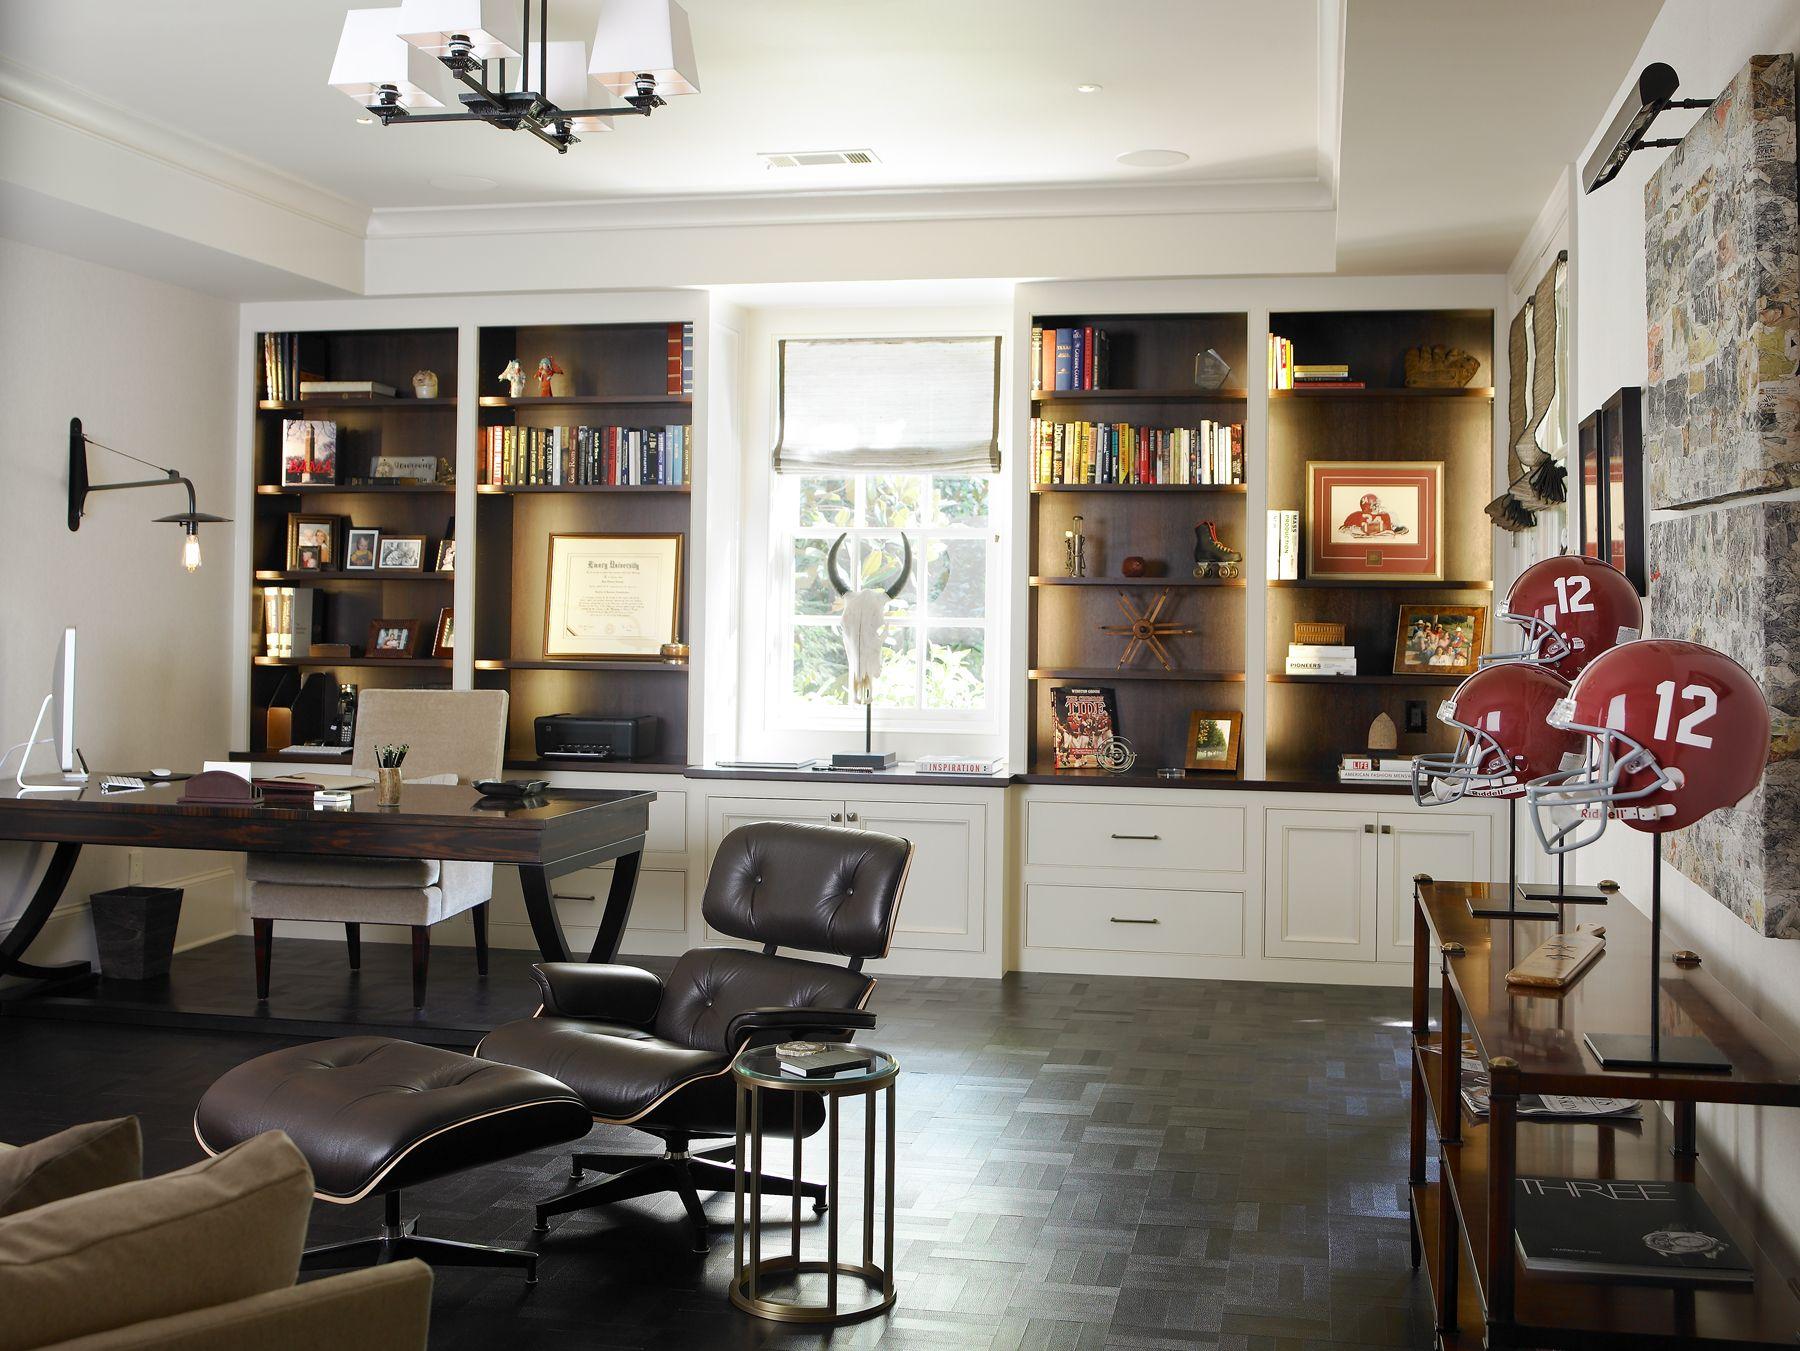 Home Office Room Design Ideas Singular living room list of things design